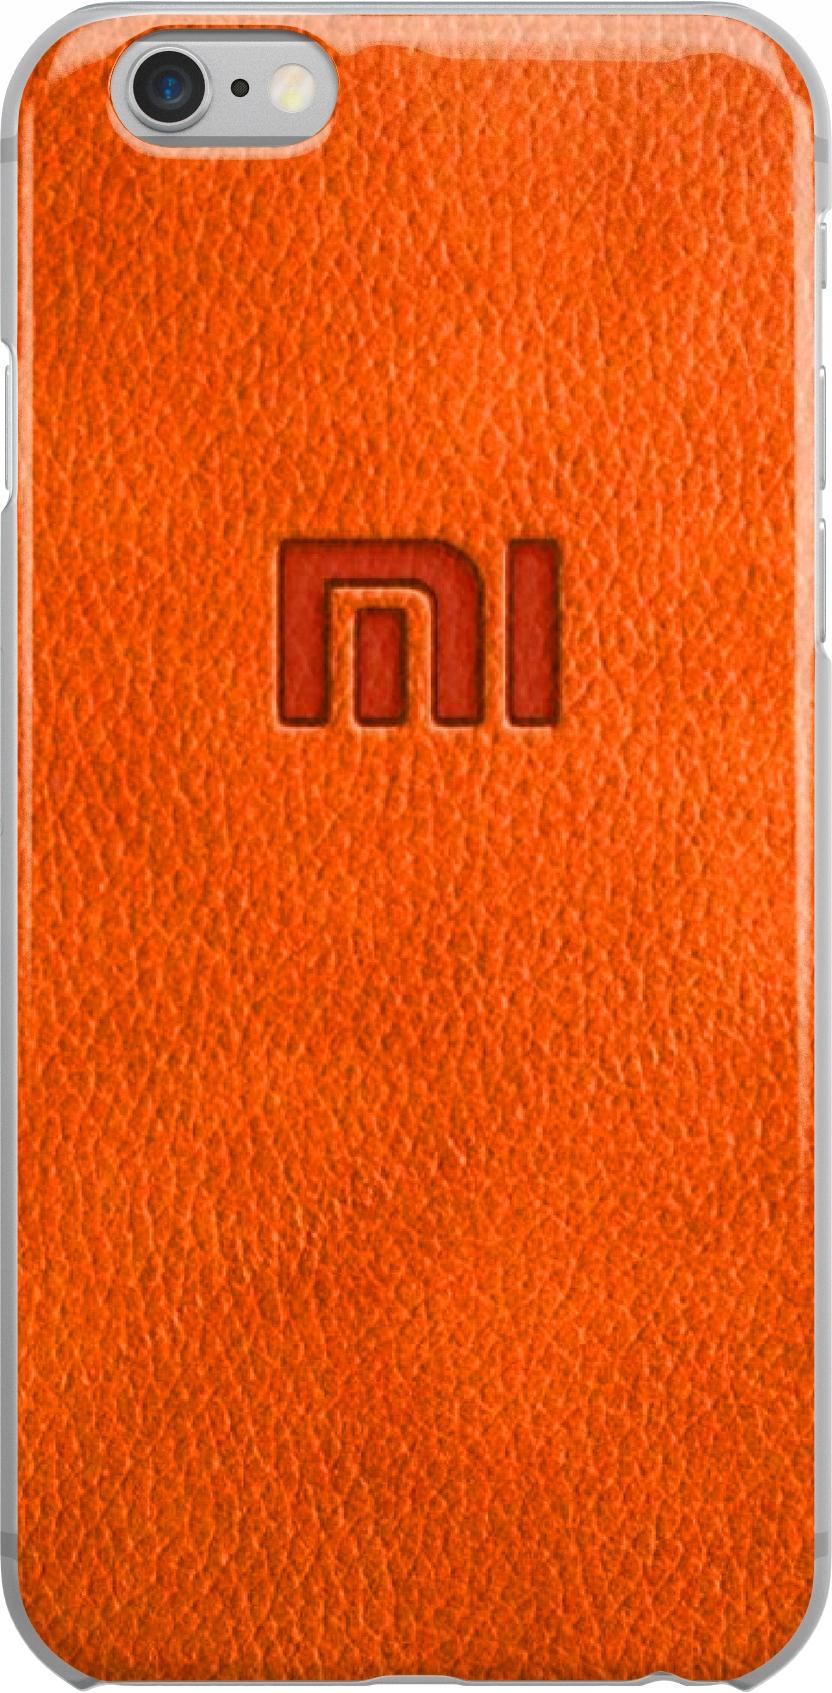 Etui Wzory Xiaomi Lenovo A3600